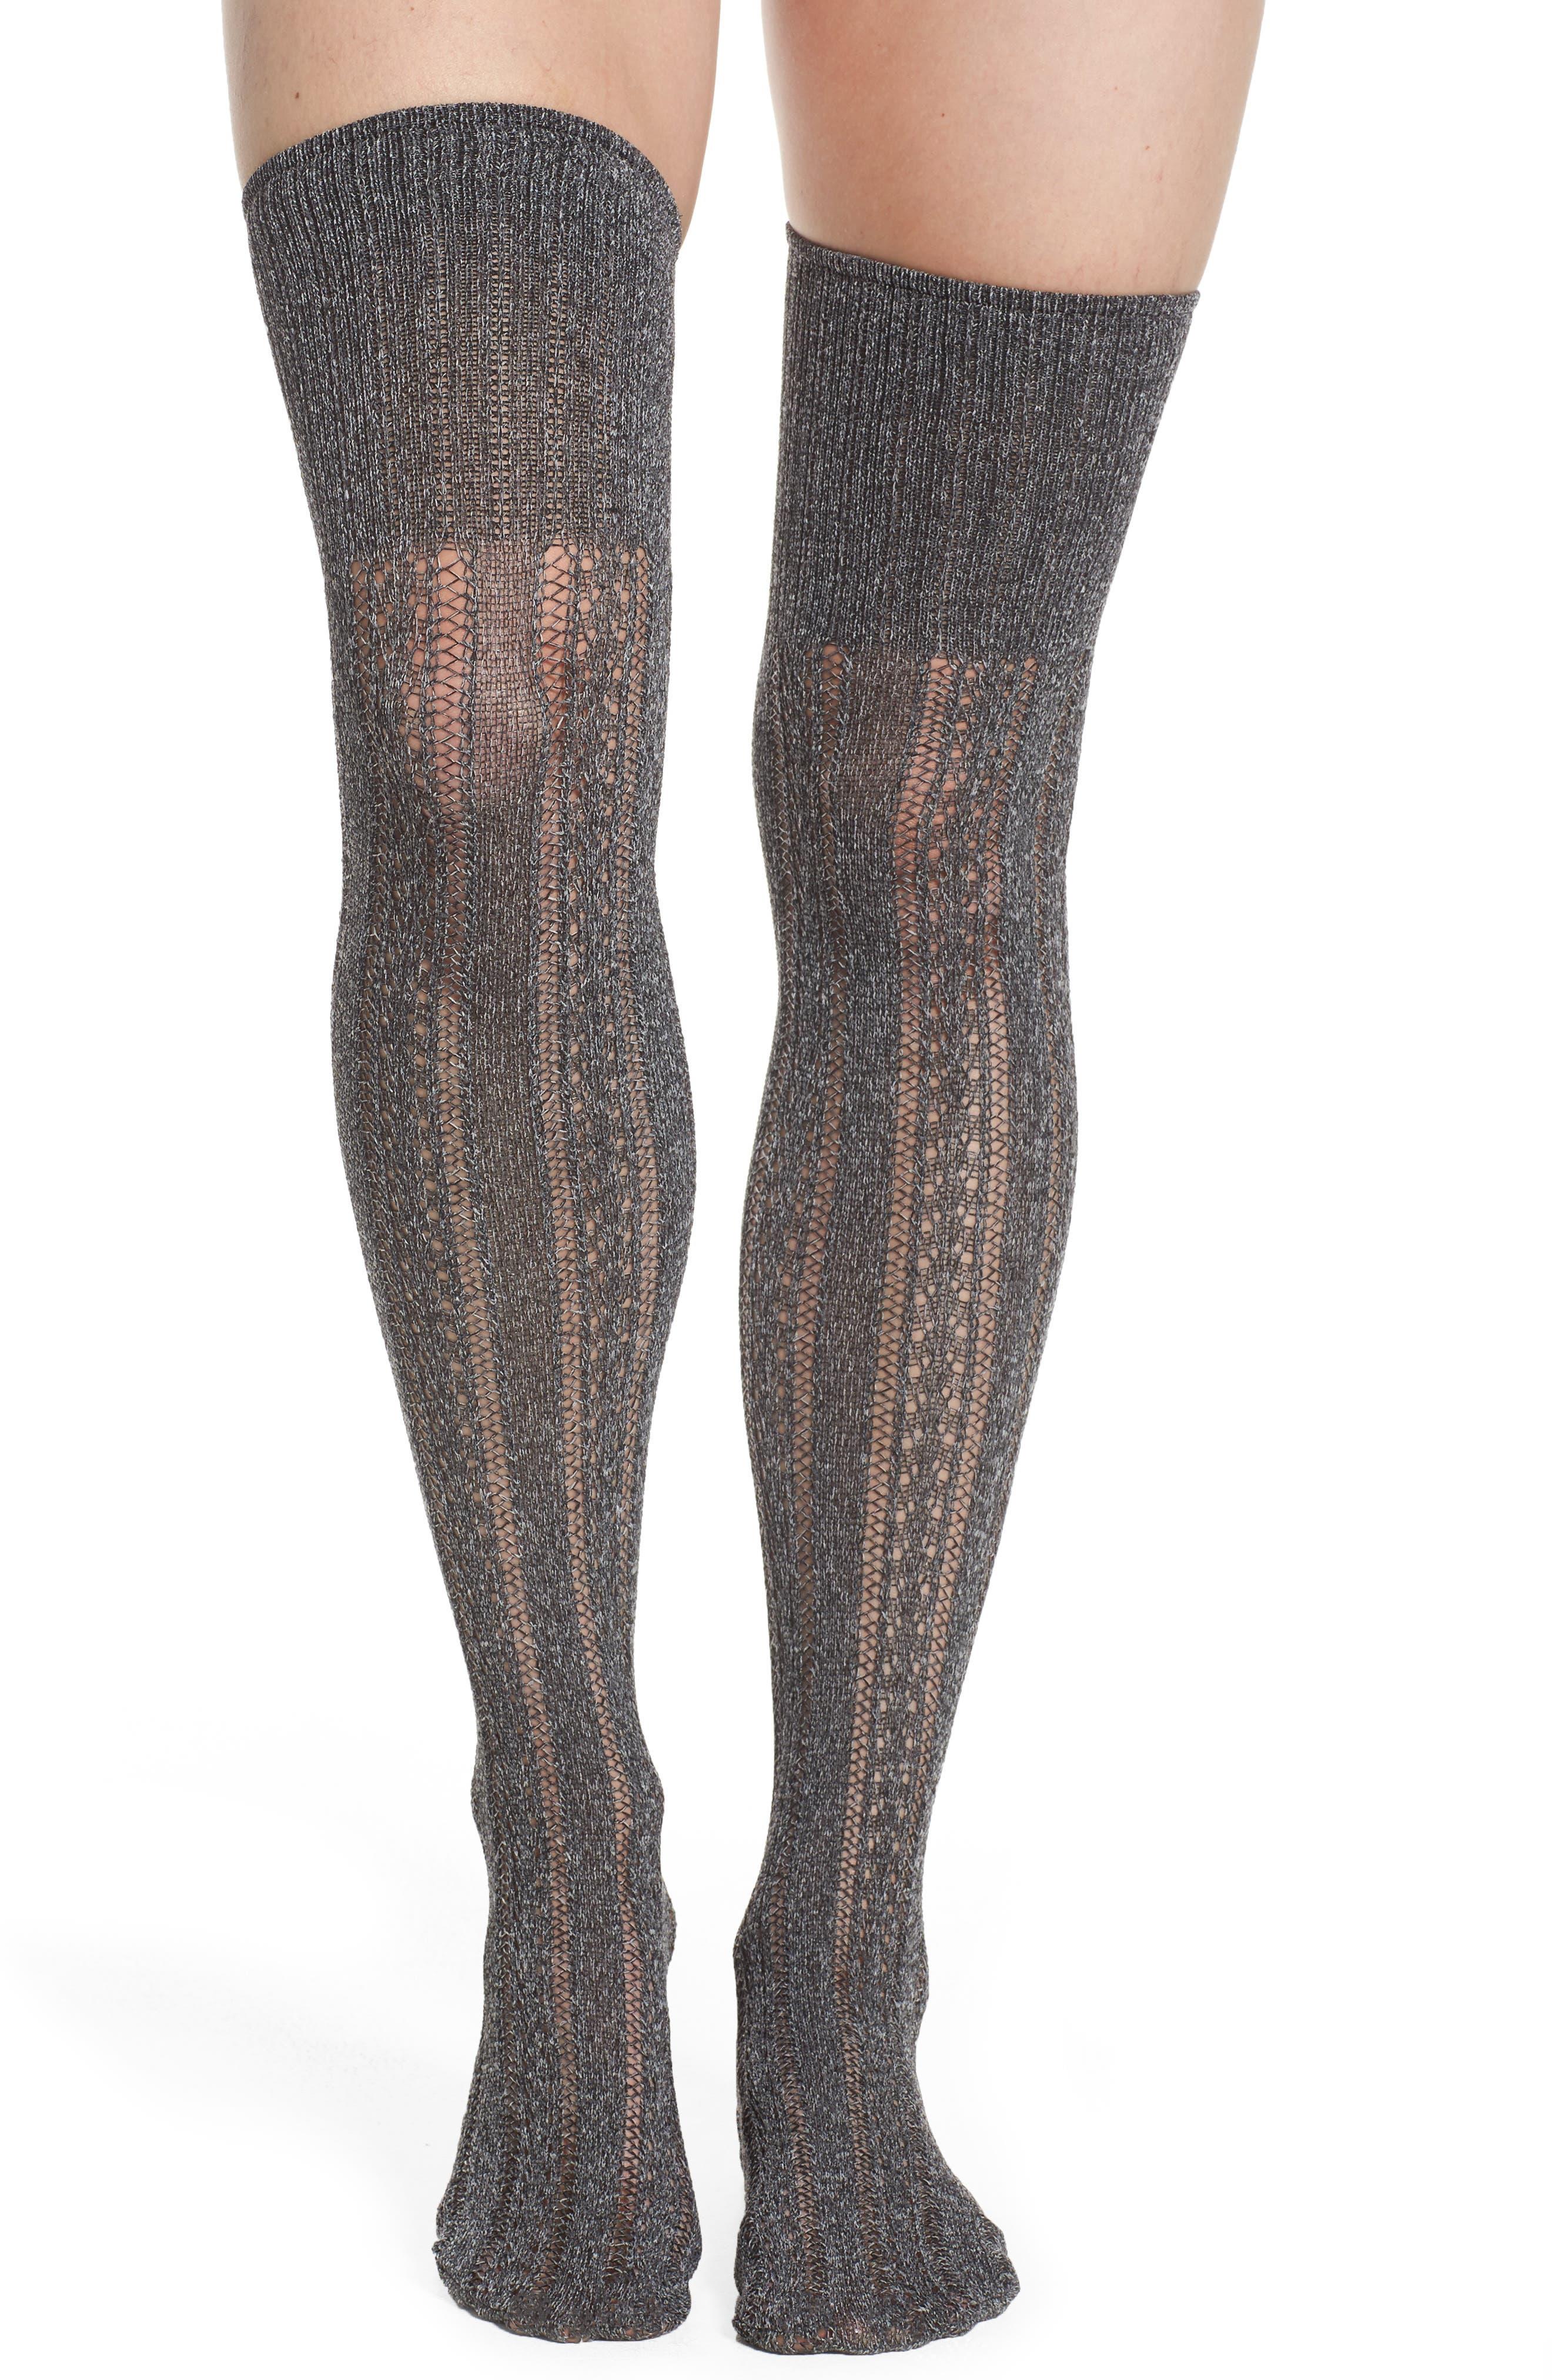 Alicia Over the Knee Socks,                         Main,                         color, Grey Melange